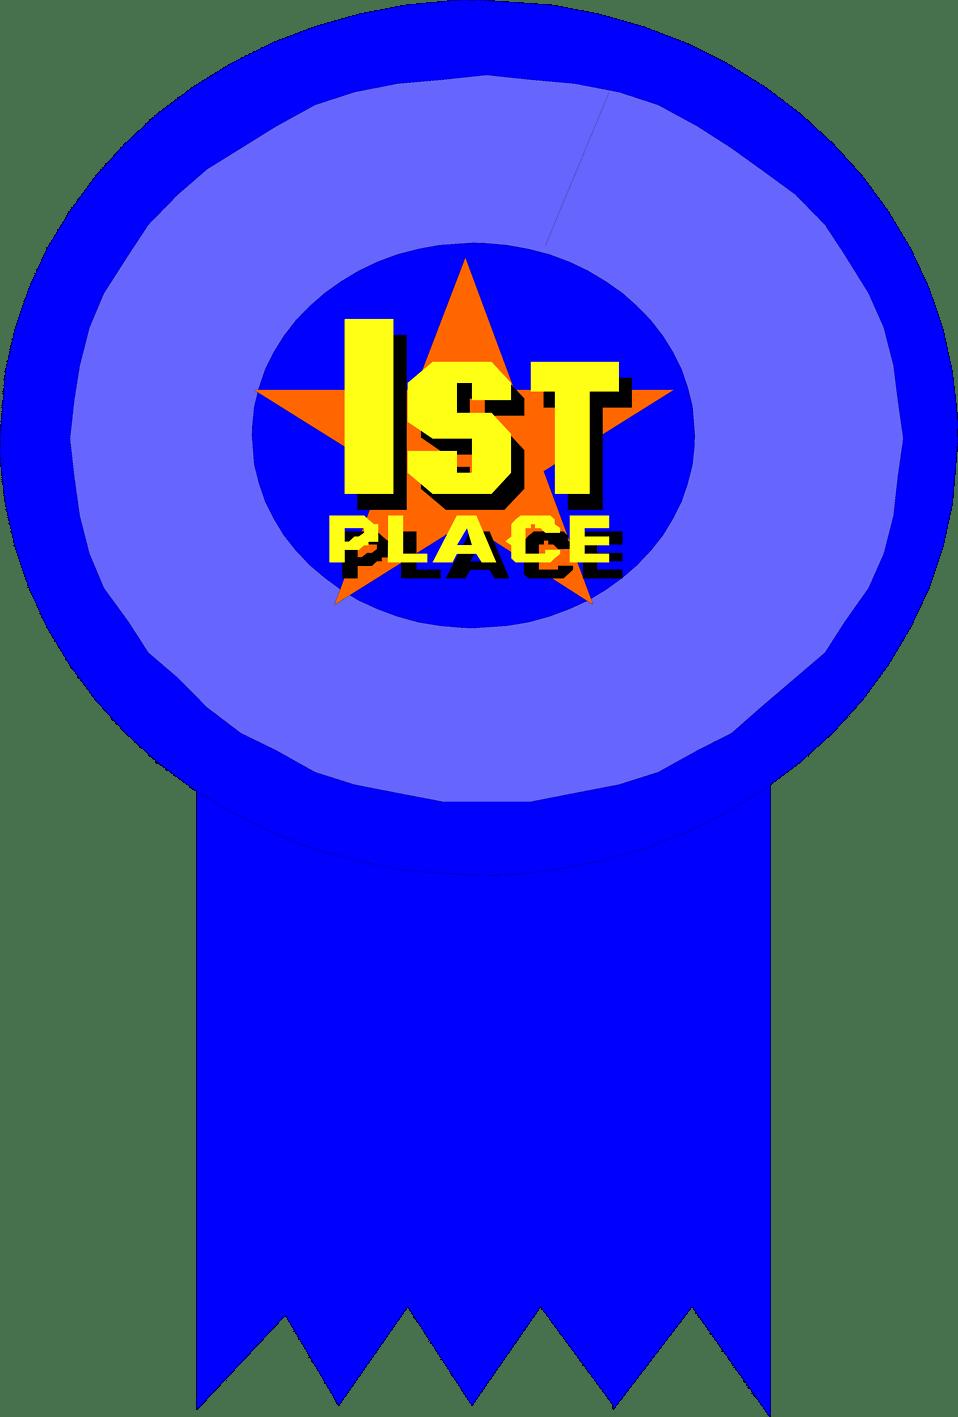 1st Place Ribbon Clip Art